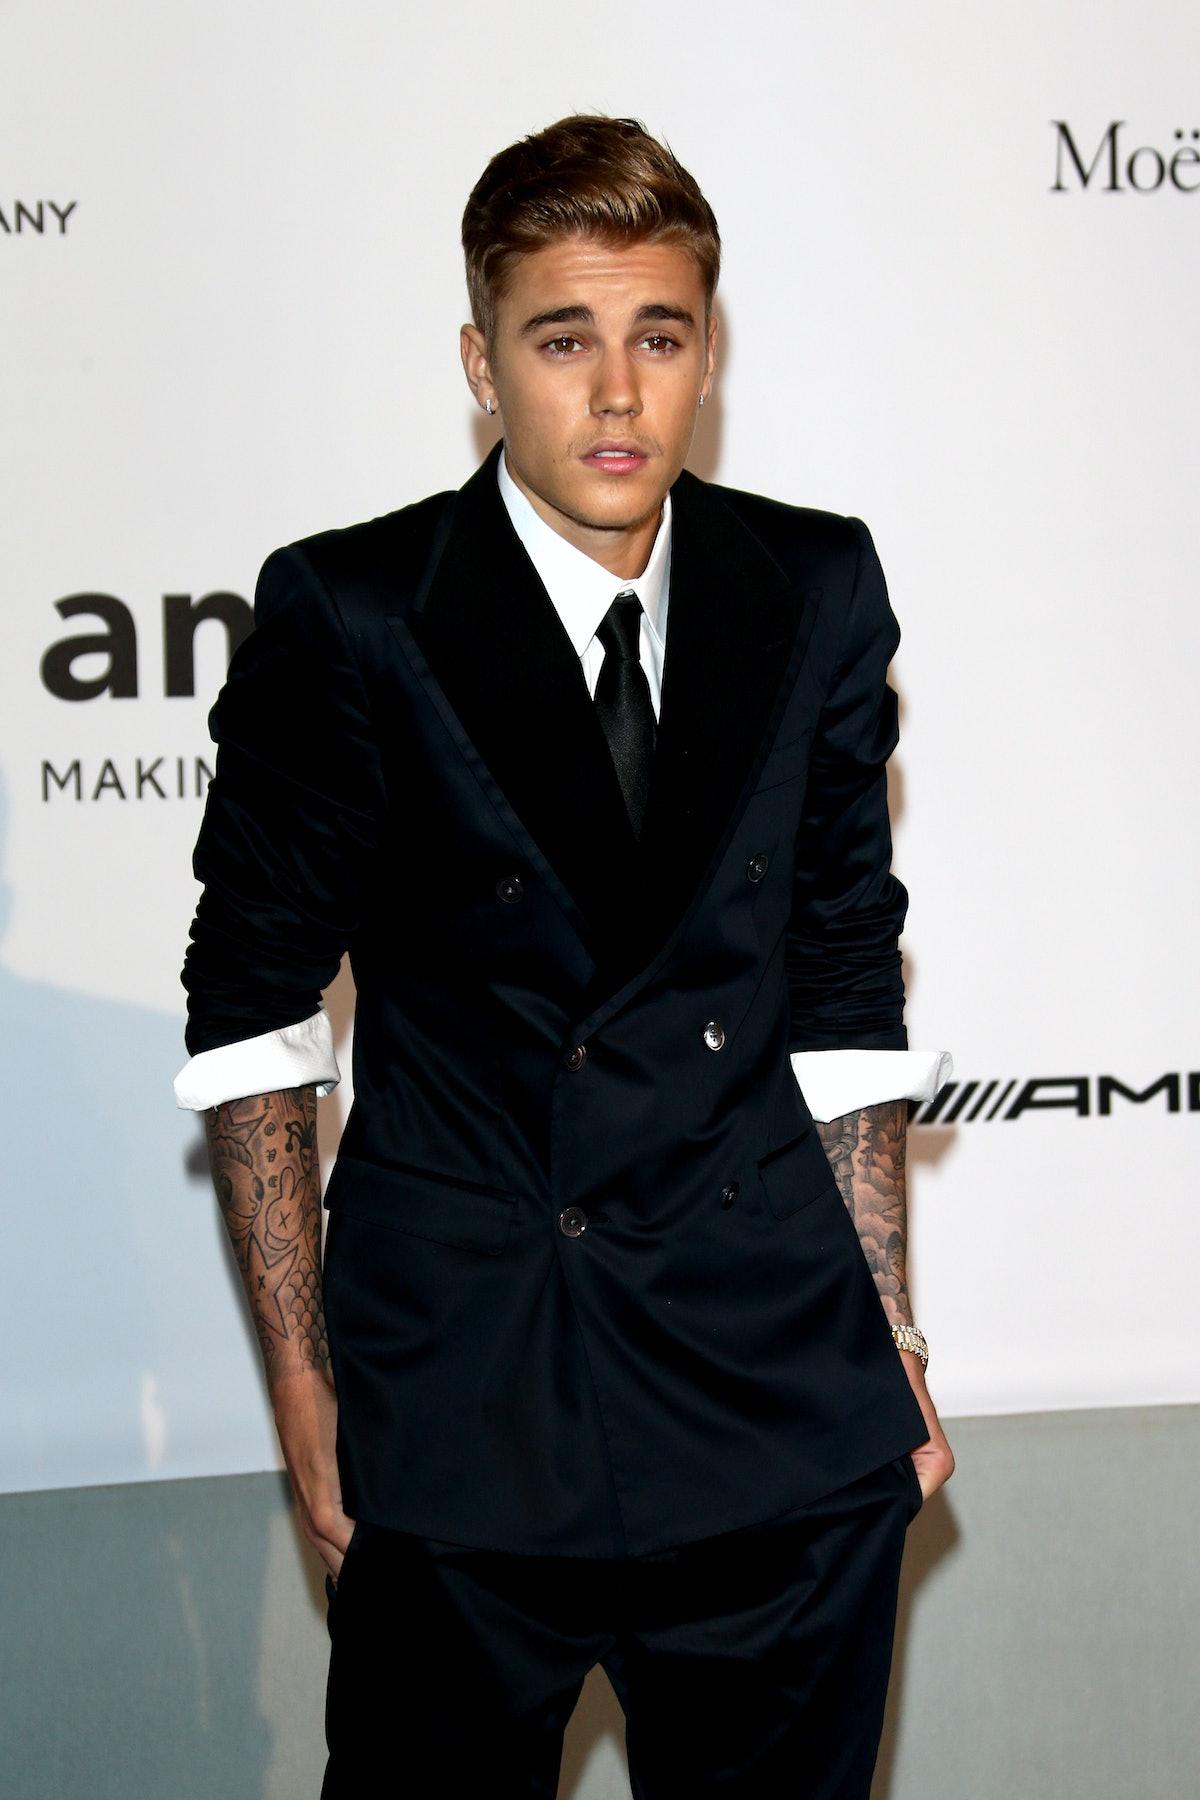 Bieber's 2 Mentors Knew About His Videos